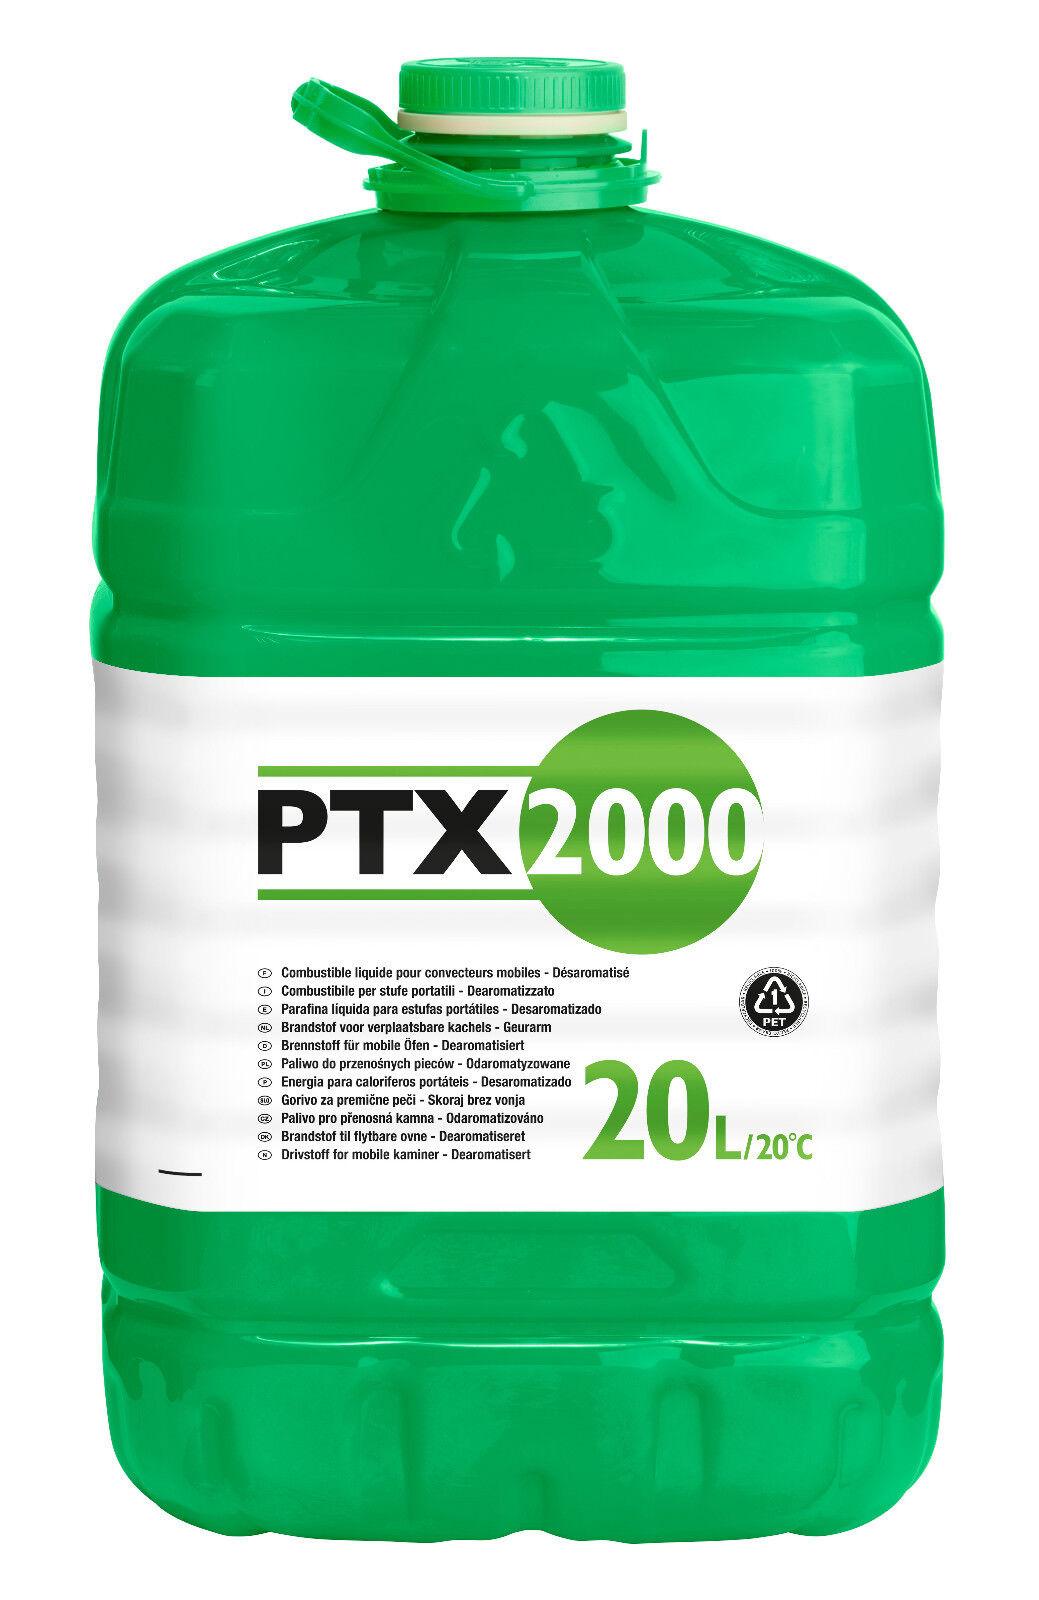 Petroleum 20 Liter Kanister PTX2000 - Qlima Tectro Petroleumofen Heizofen